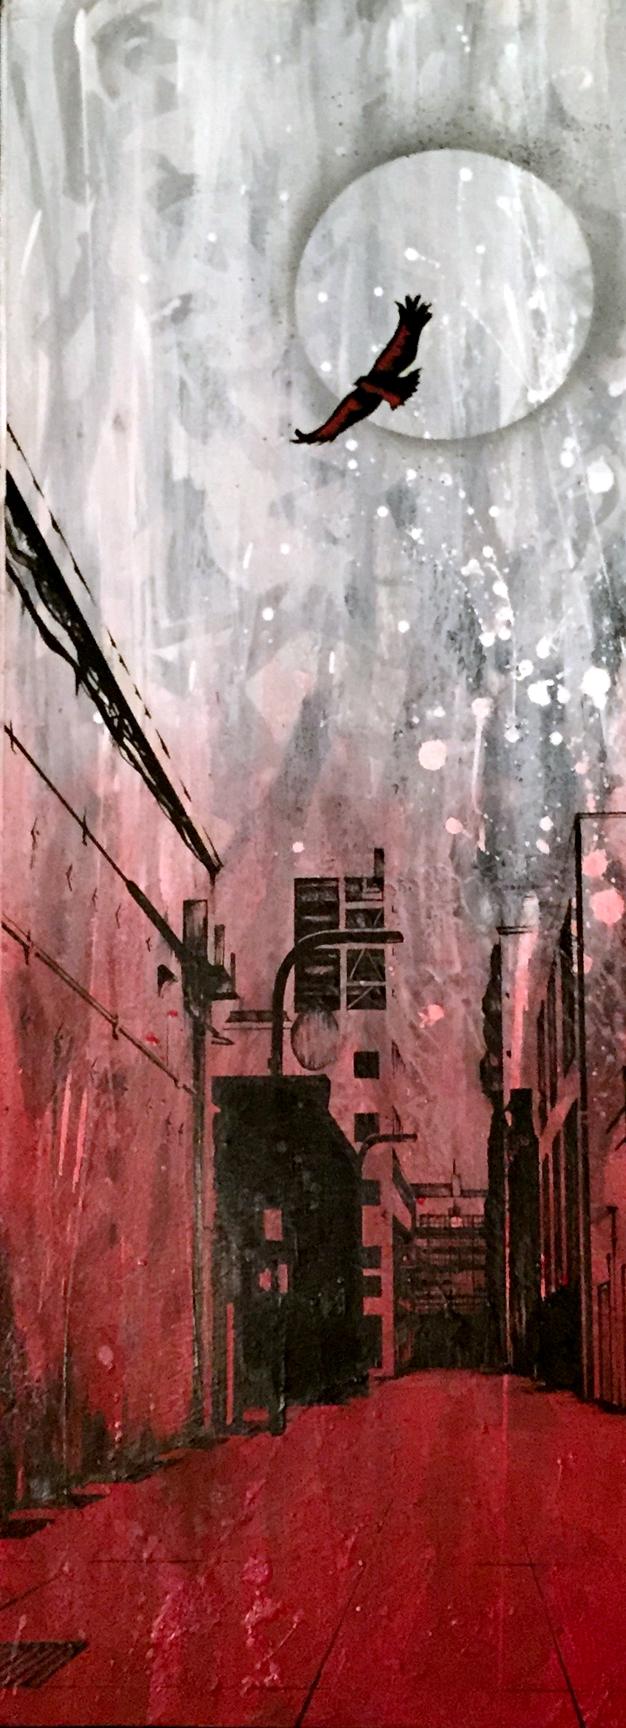 Falcon Alley.jpg